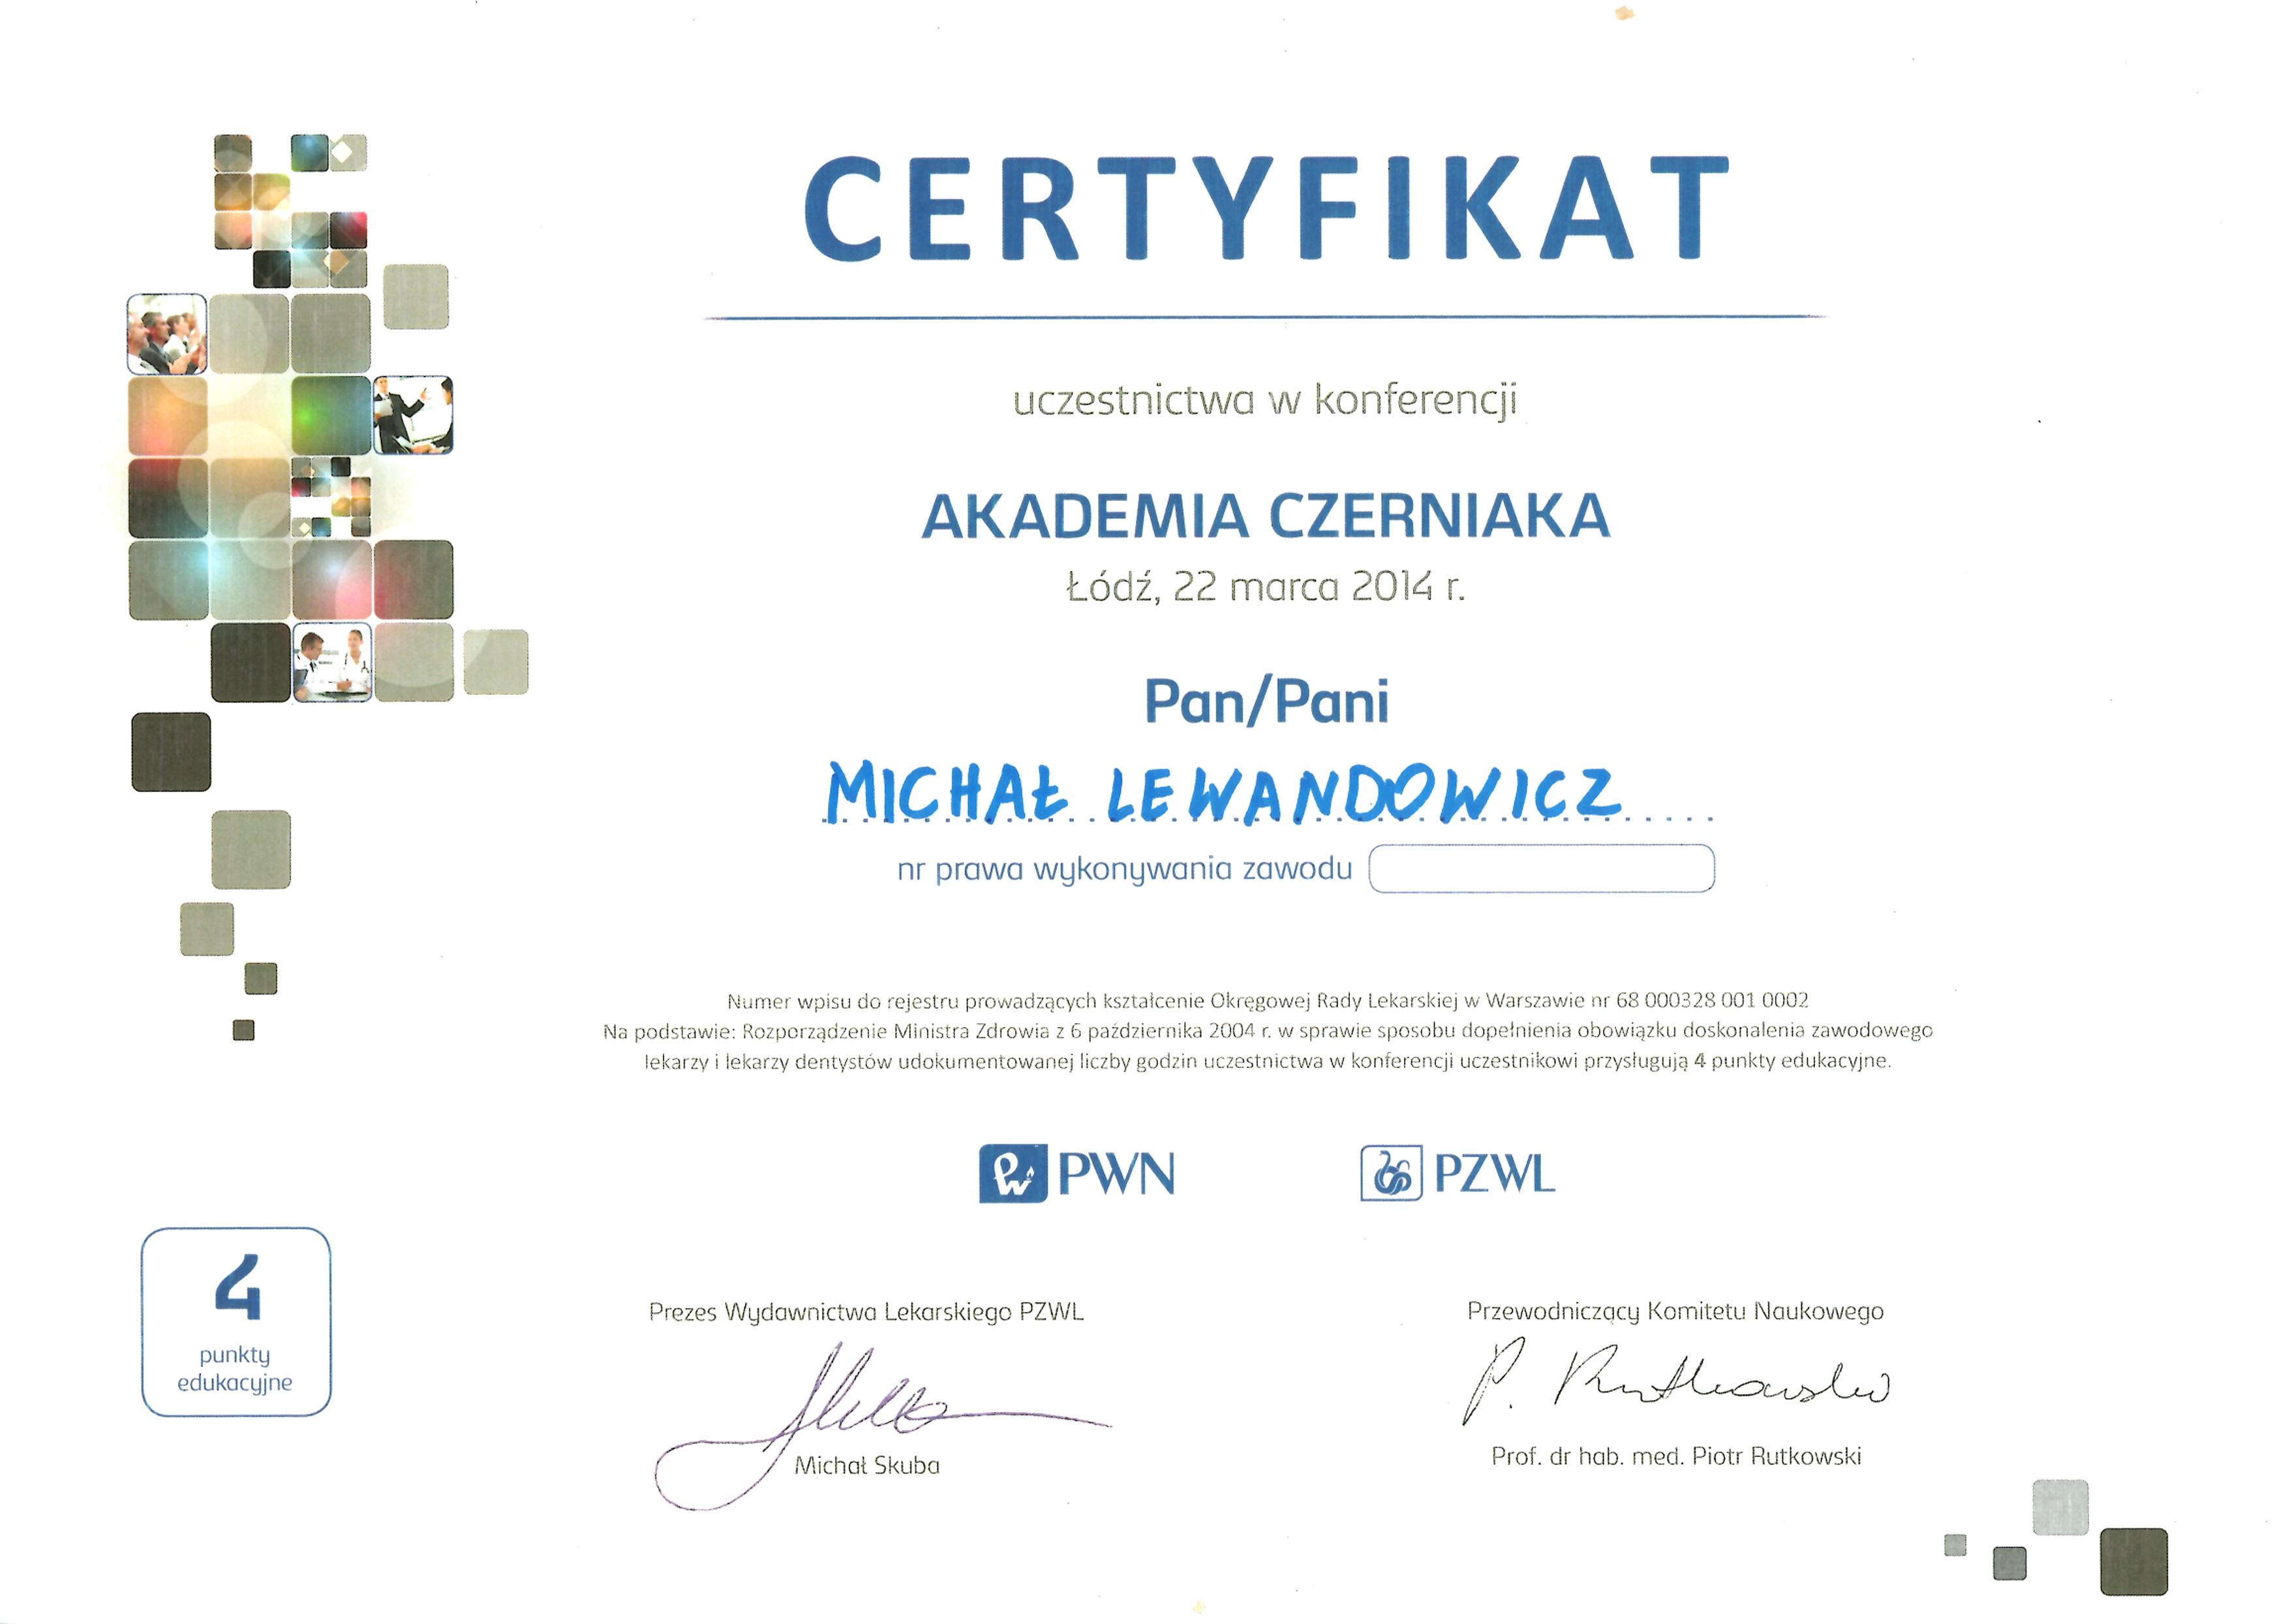 Cert AkadCz2014 - dr n. med. Michał Lewandowicz